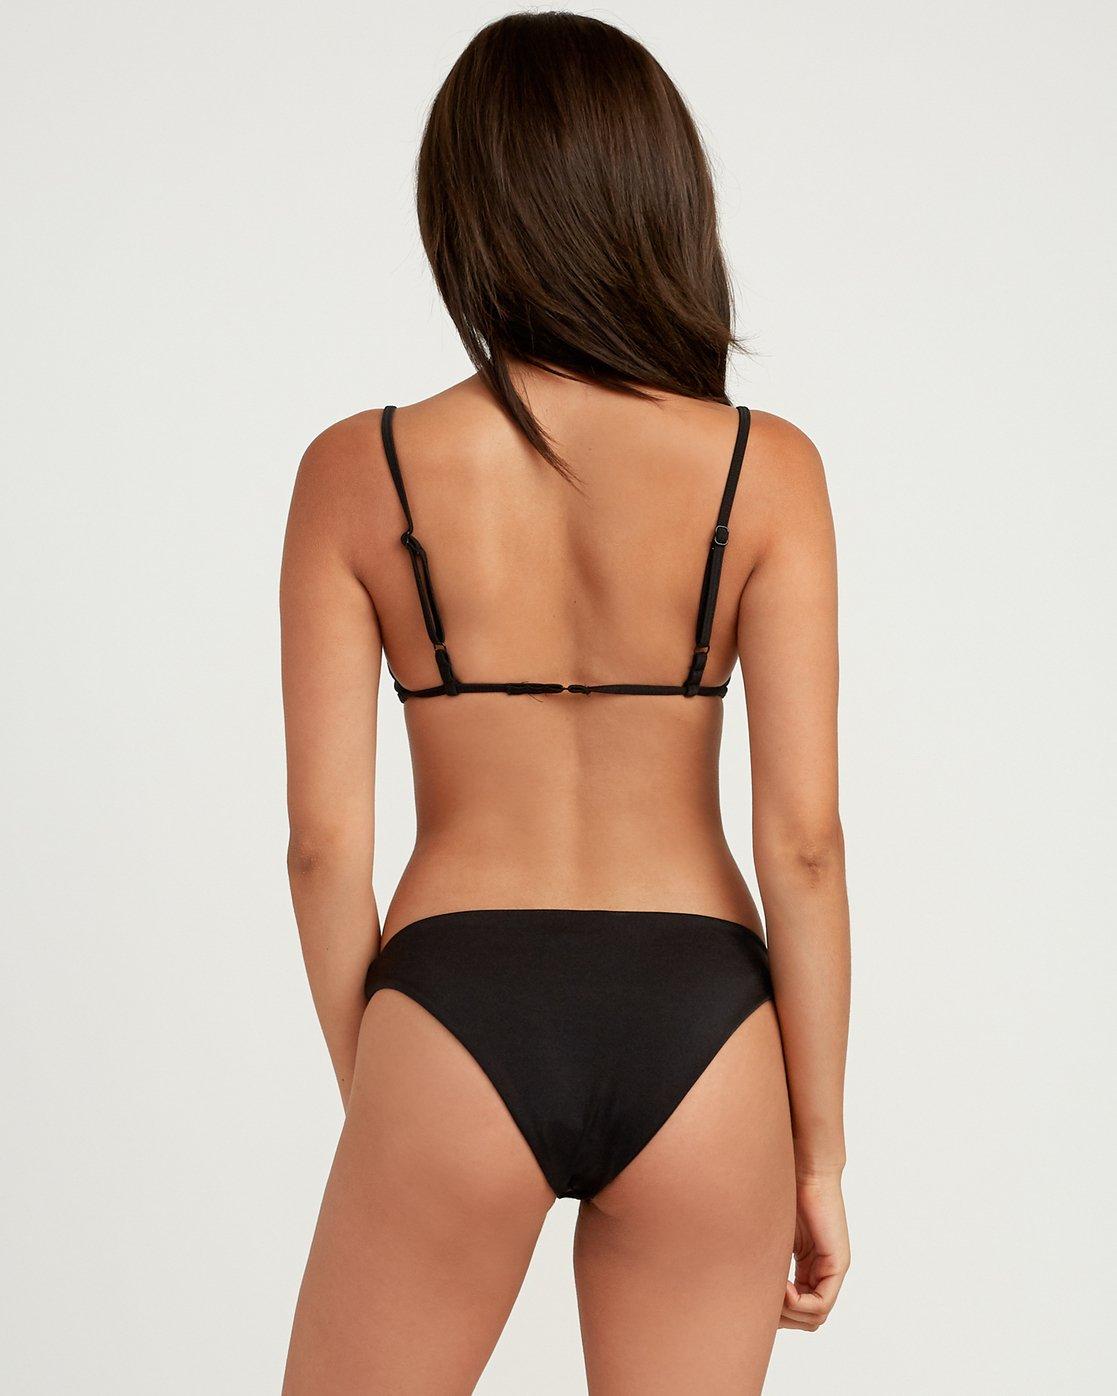 0 Solid Shimmer Medium Bikini Bottoms Black XB21QRSM RVCA